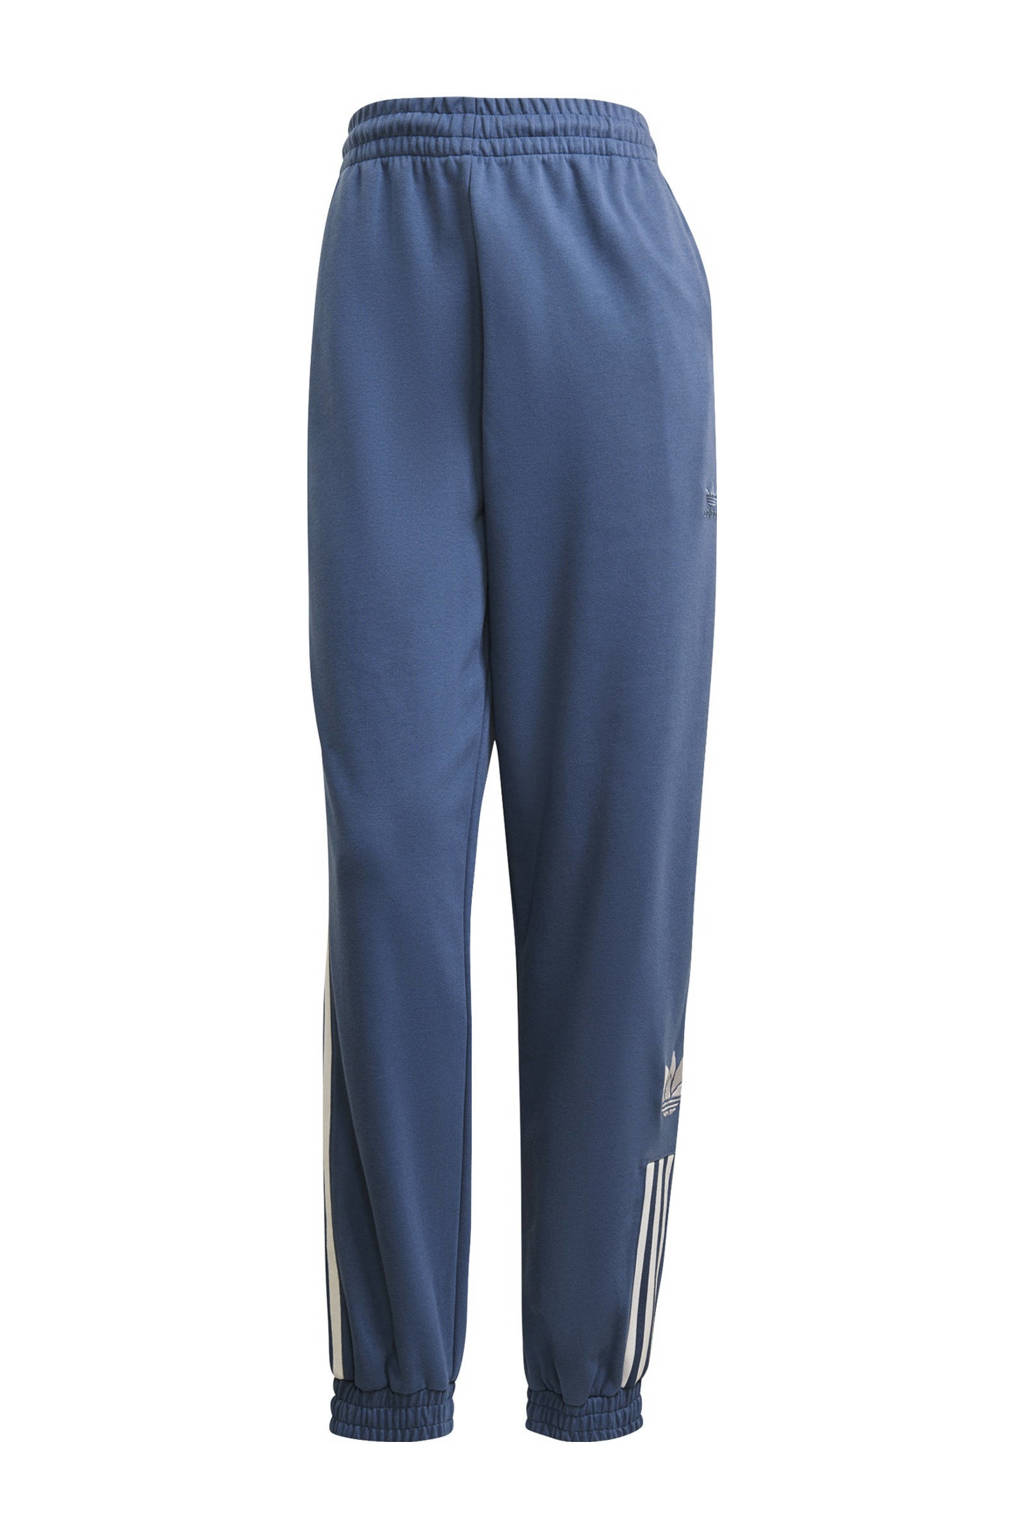 adidas Originals Adicolor joggingbroek blauw/wit, Blauw/wit